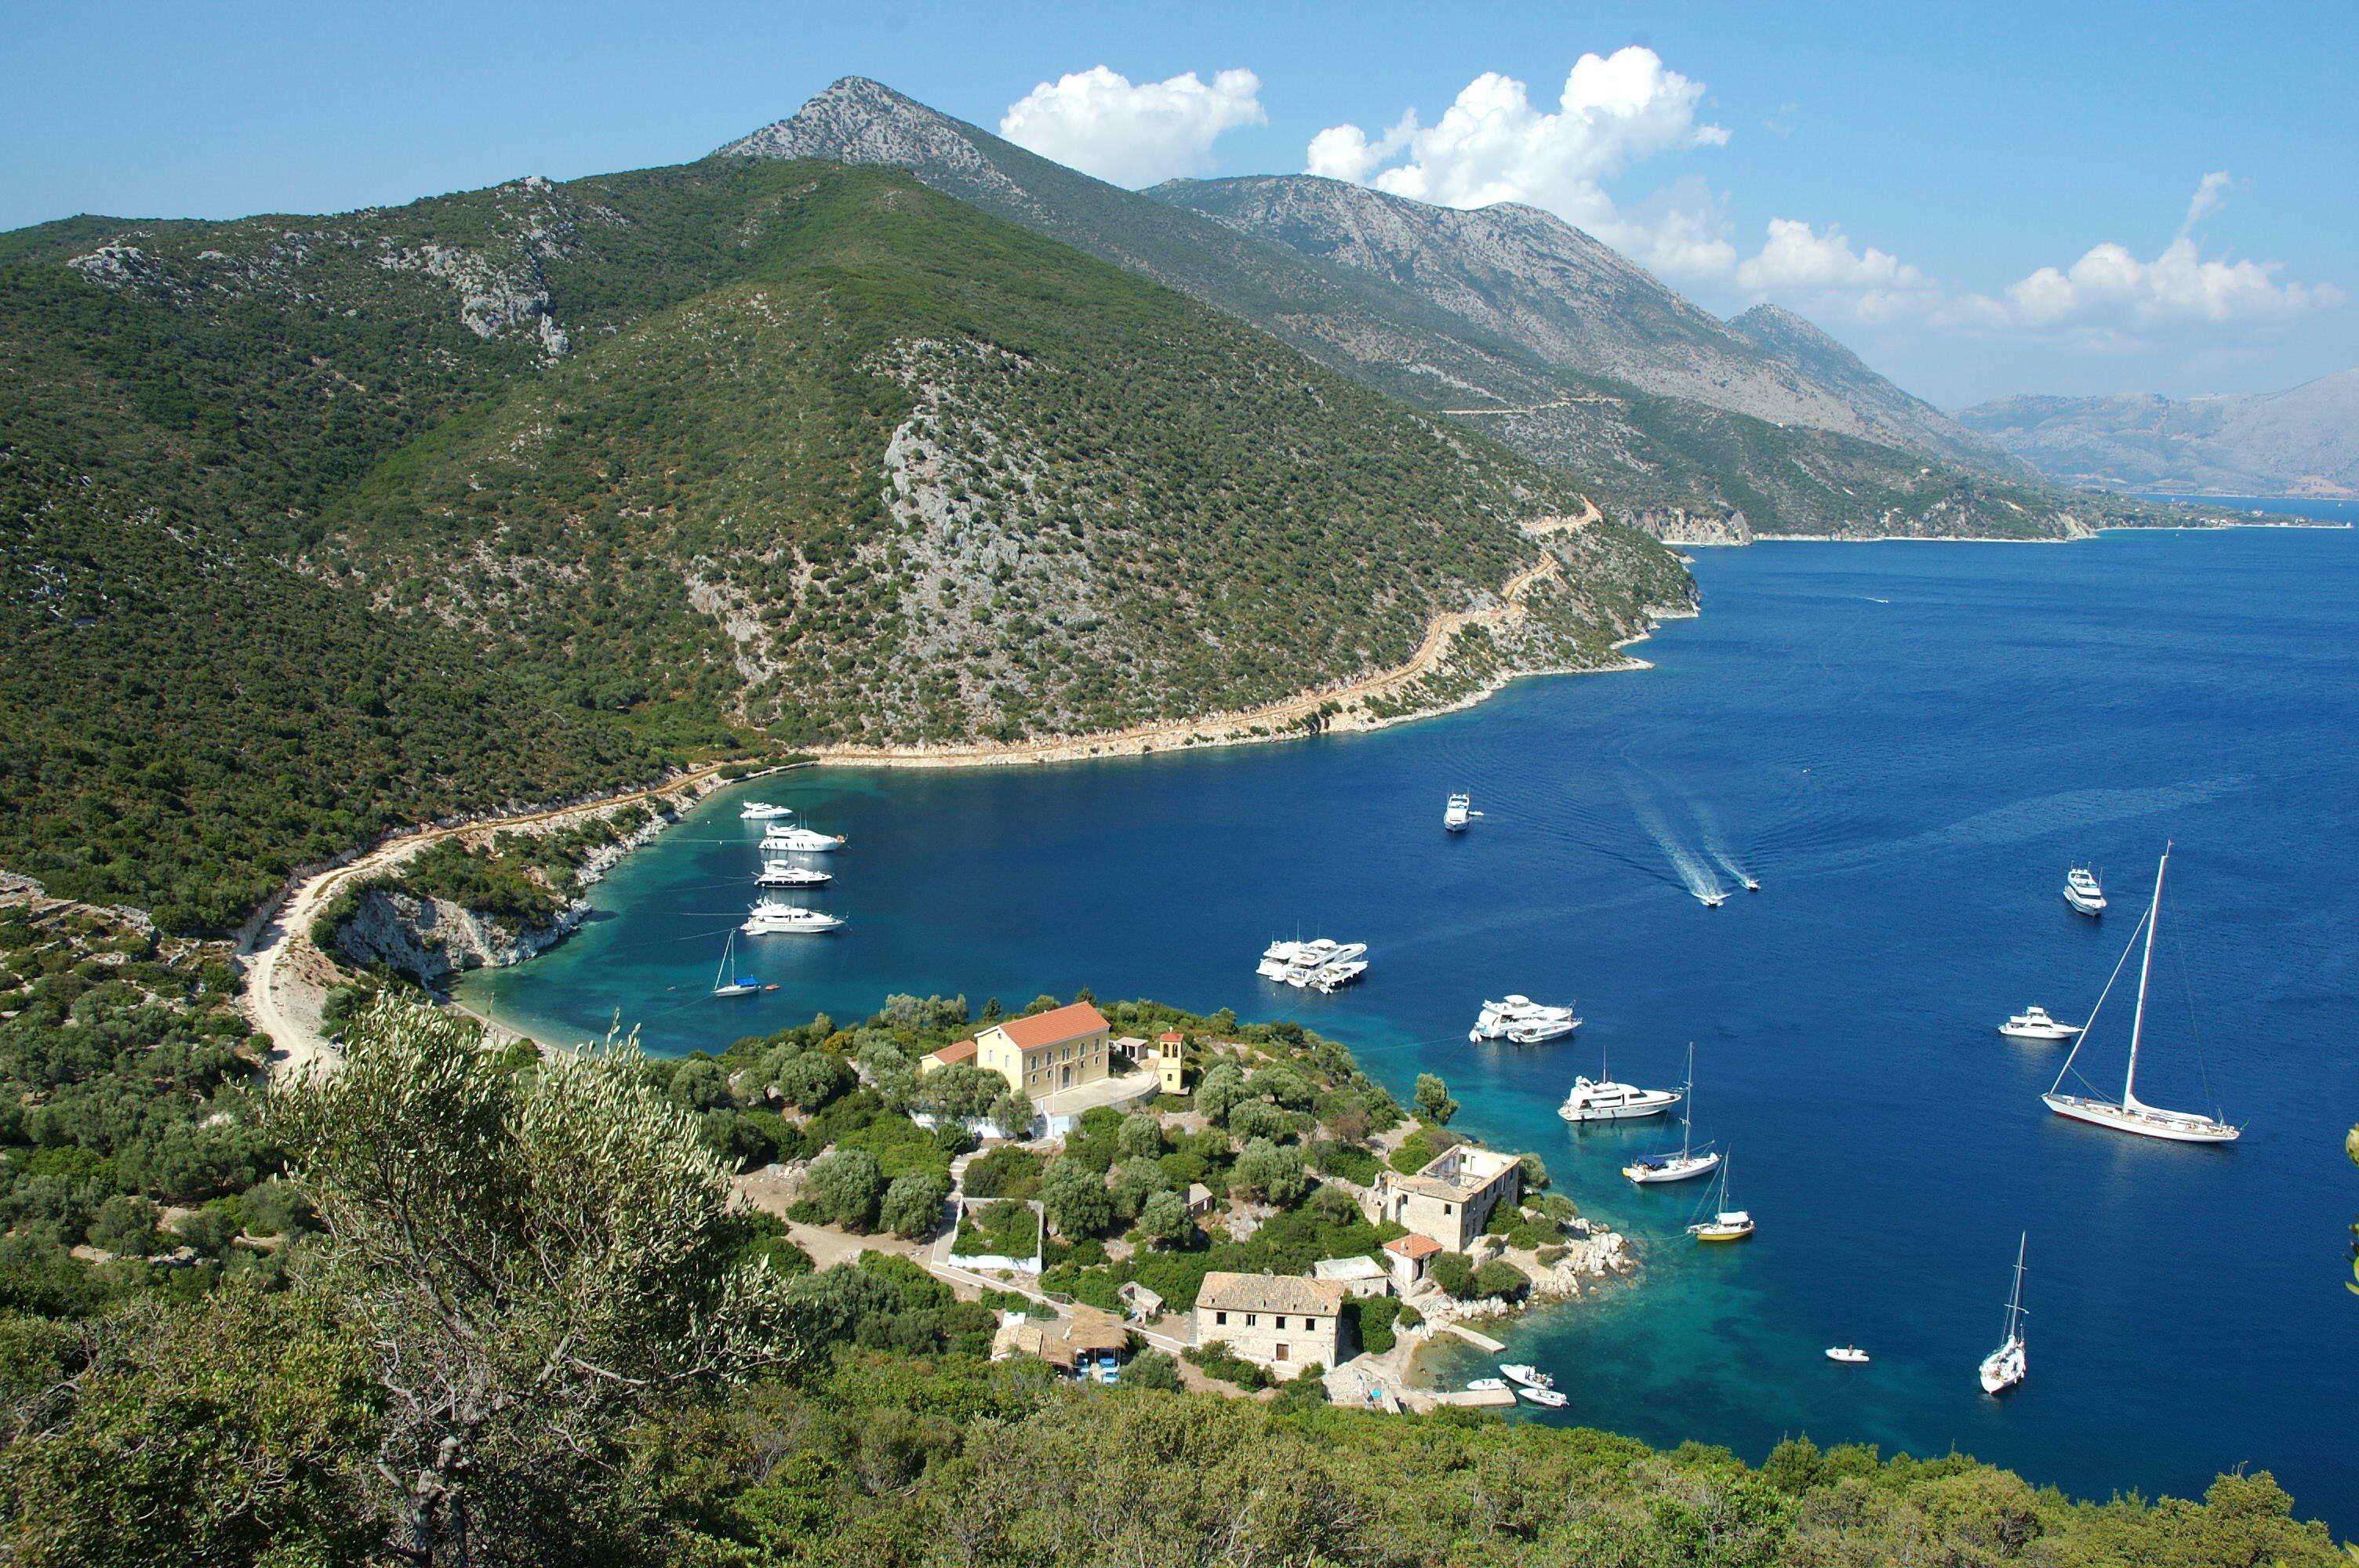 http://www.esys.org/rev_info/Griechenland/Kalamos_(Insel)_Porto_Leone-hq.jpg